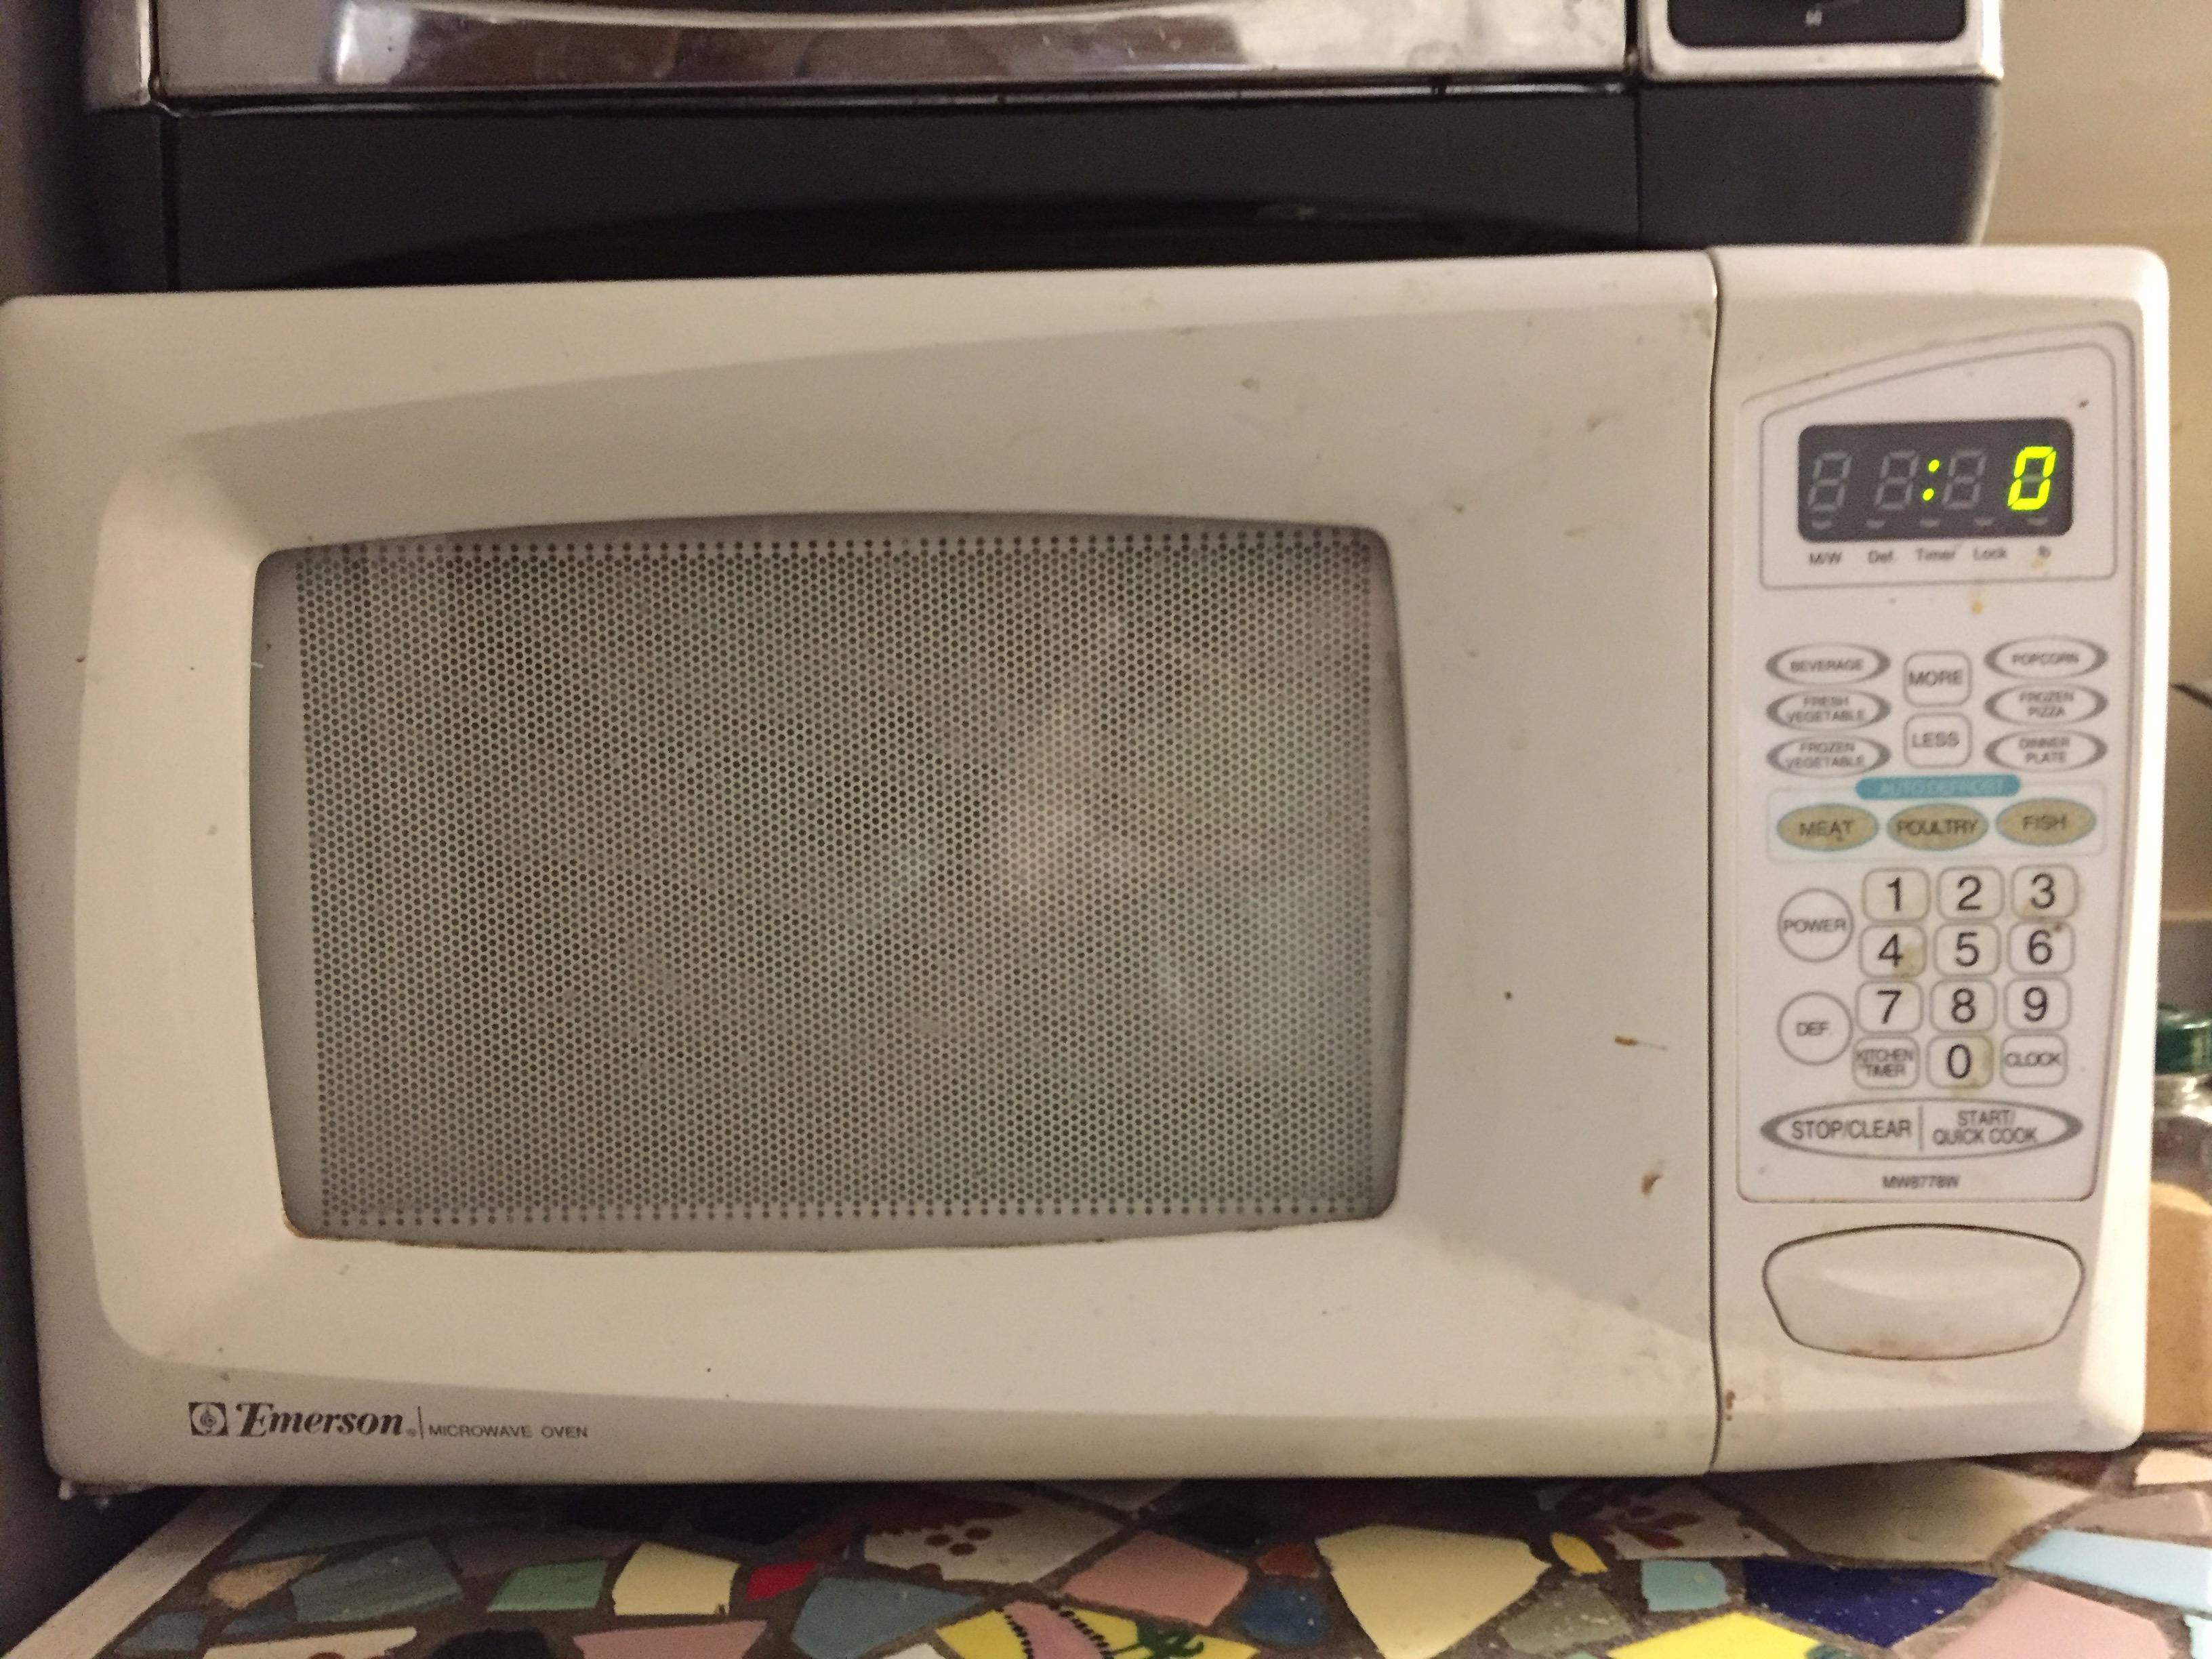 https commons wikimedia org wiki file emerson microwave jpg